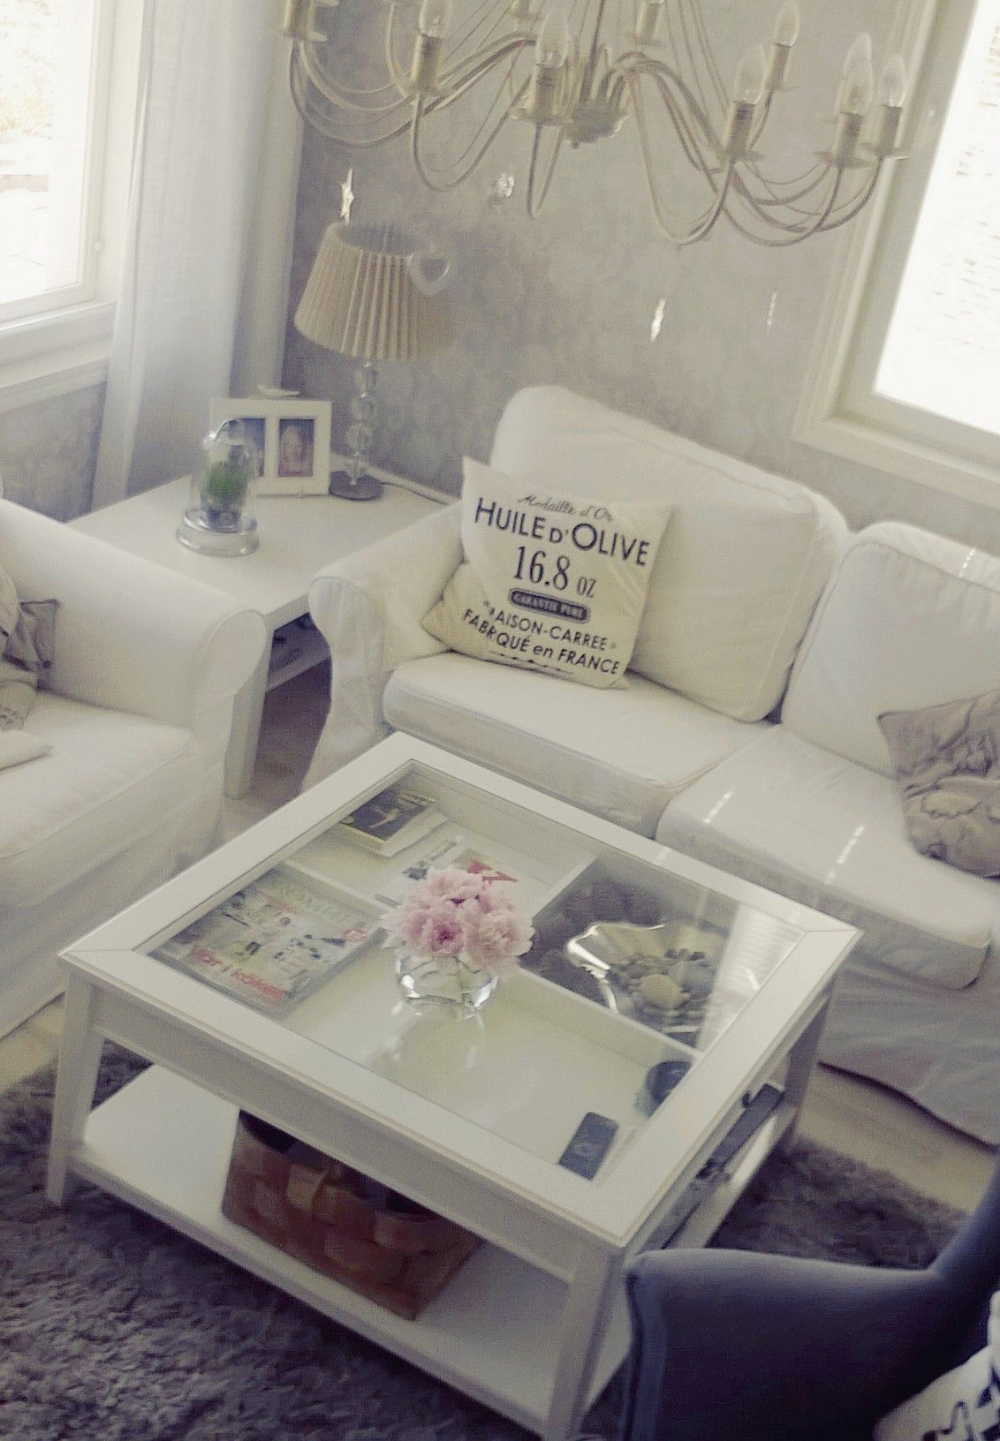 Perfect Glass Living Room Table Livingroom Ikea Liatorp Coffee Table Love The Idea Of Putting Big Of 38 Am Decoracion De Unas Mesa Centro Ikea Decoracion Ikea [ 1441 x 1000 Pixel ]